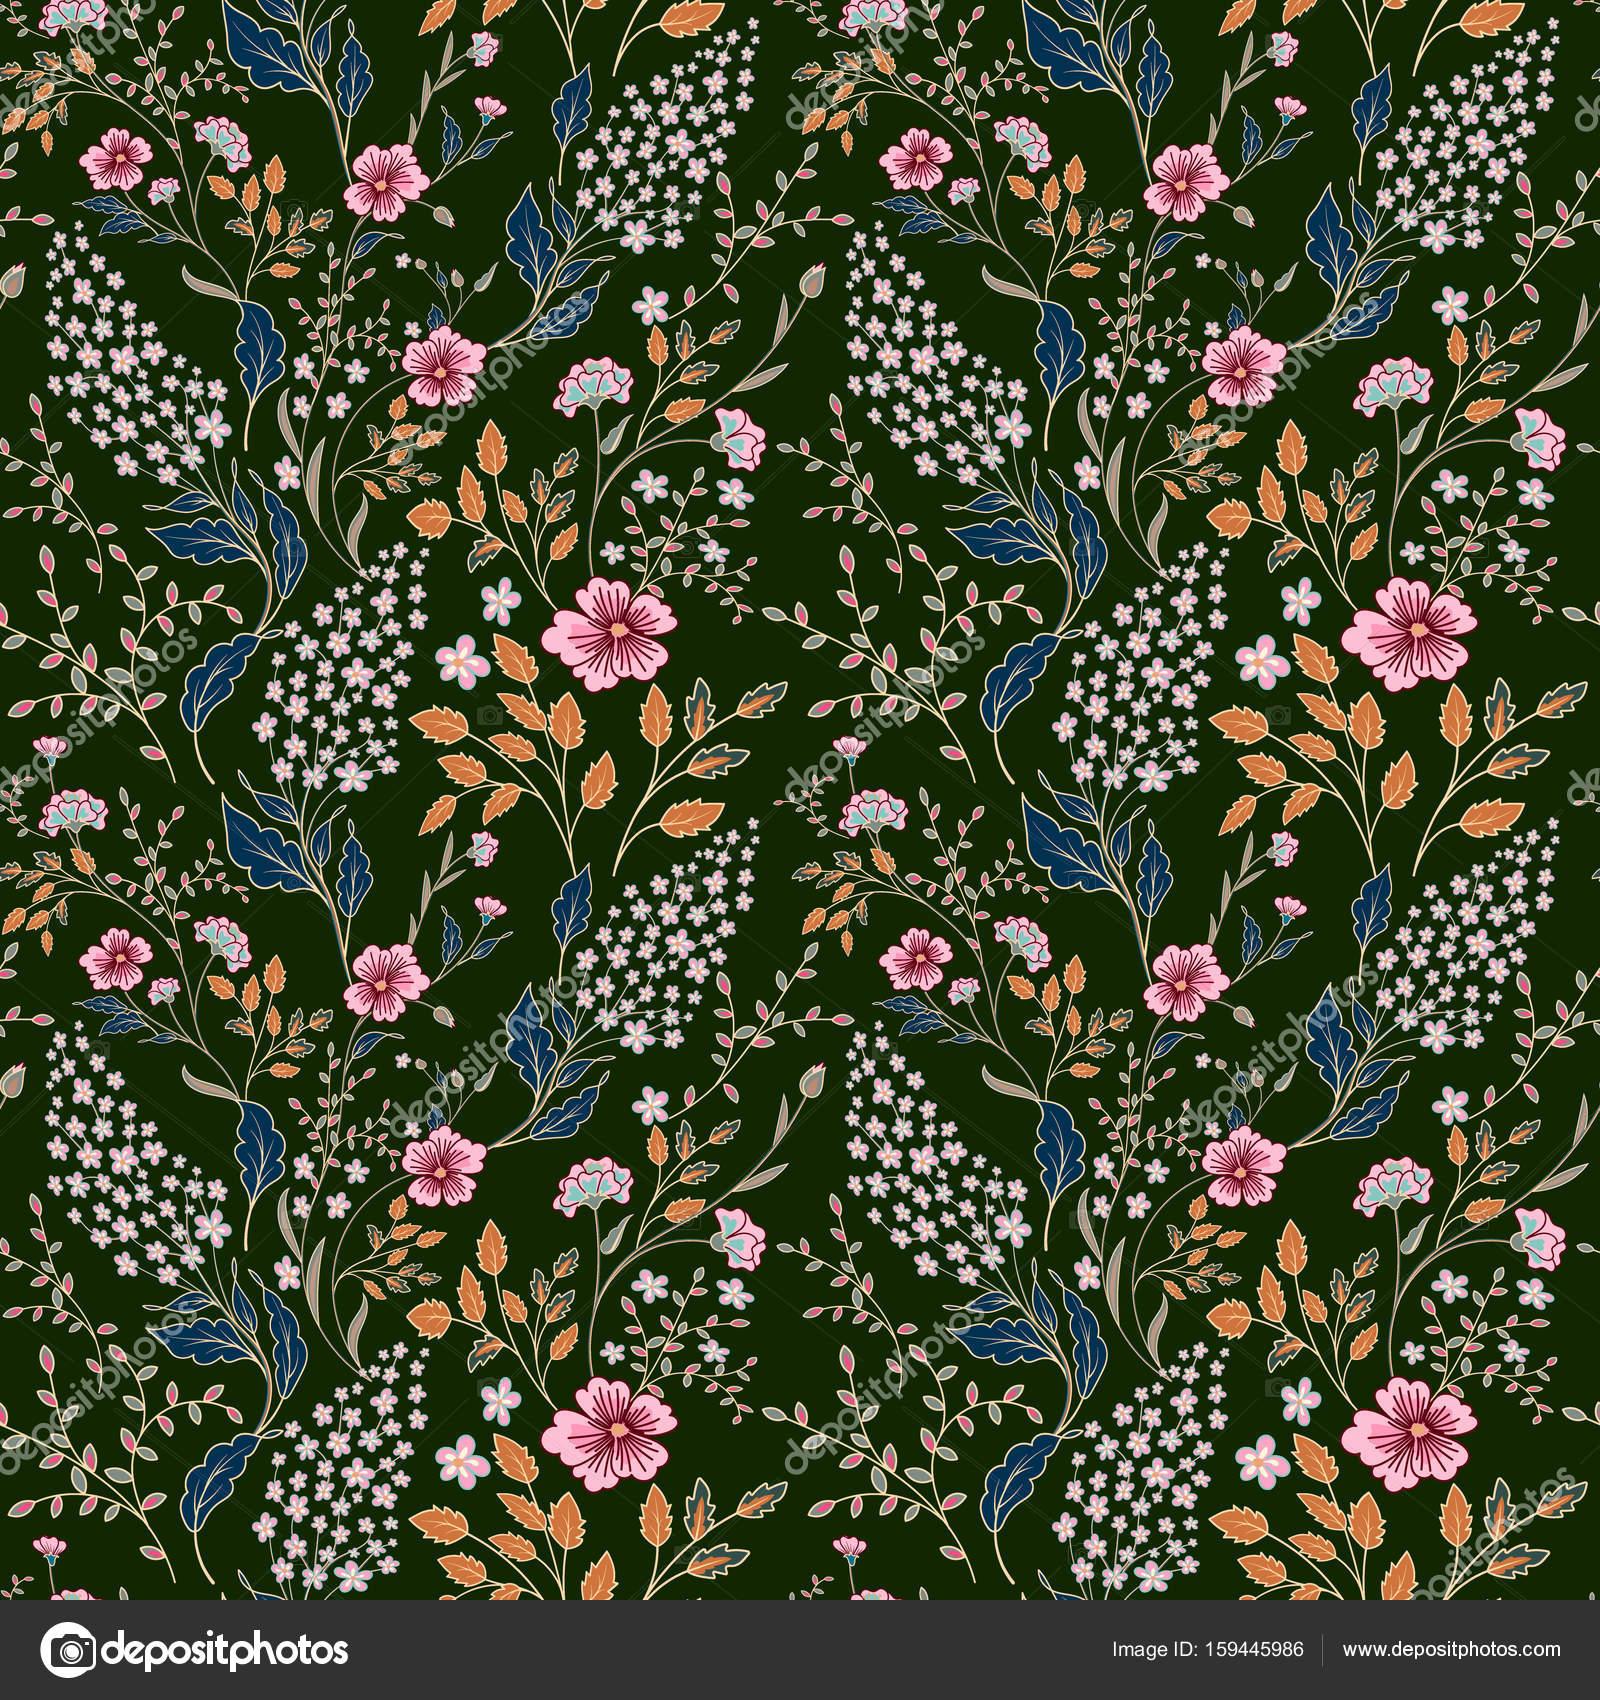 4c930e7a7ce2 Delicada rosa azul laranja branca allover estampa floral em fundo verde  escuro — Vetor de leezarius